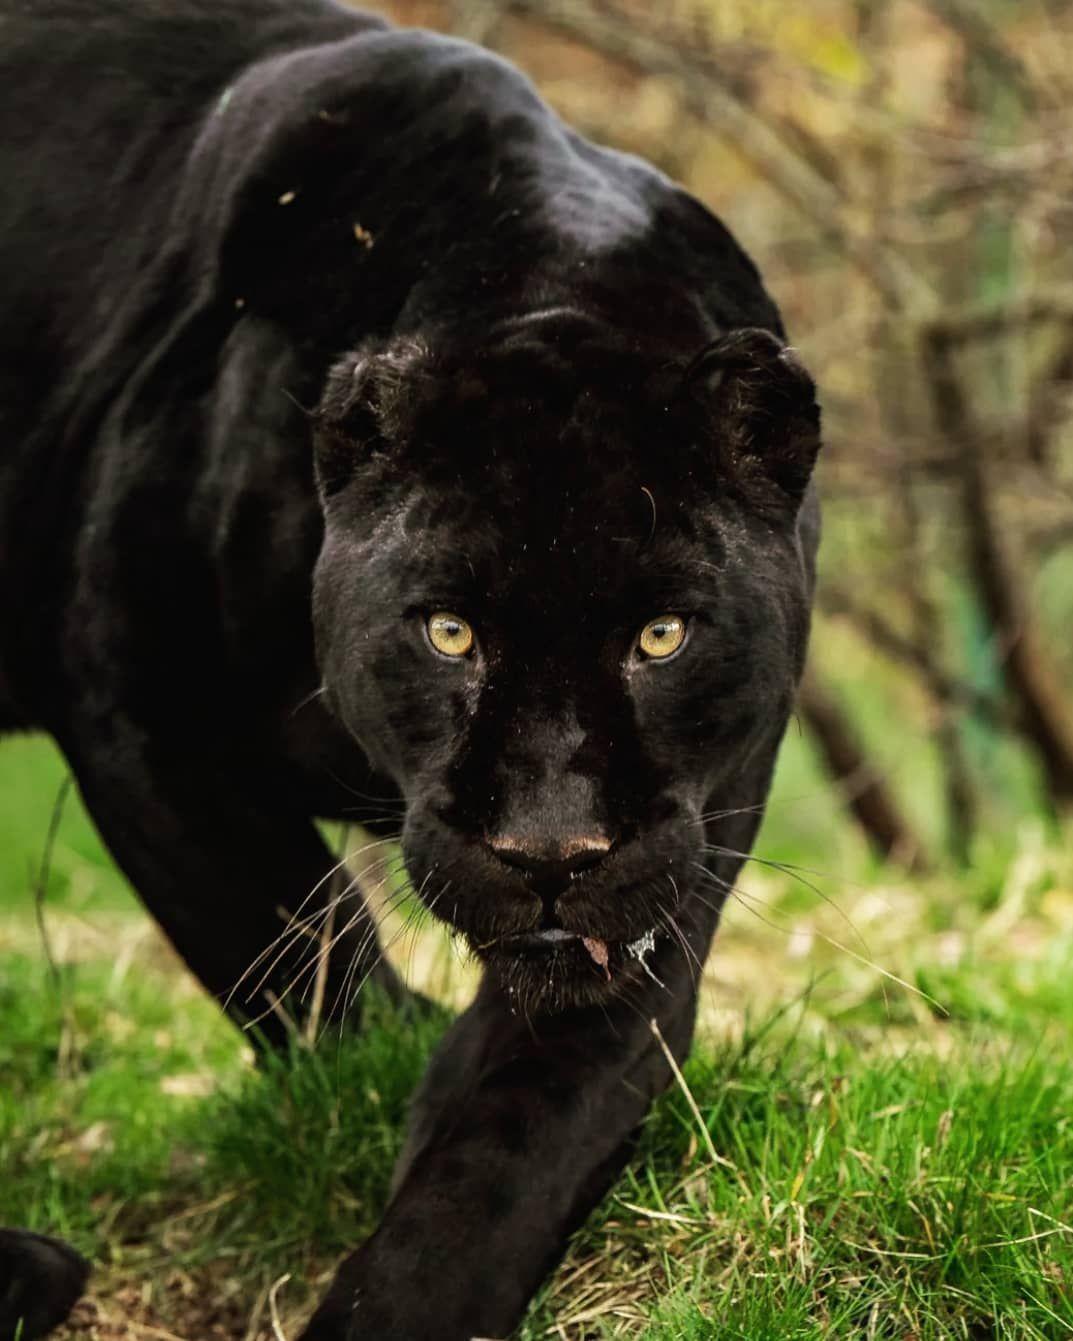 Wildlife Animals Nature On Instagram Photography By C Colin Langford Black Jaguar Series Taken At The Big Cat Sanctu Black Jaguar Cat Sanctuary Animals